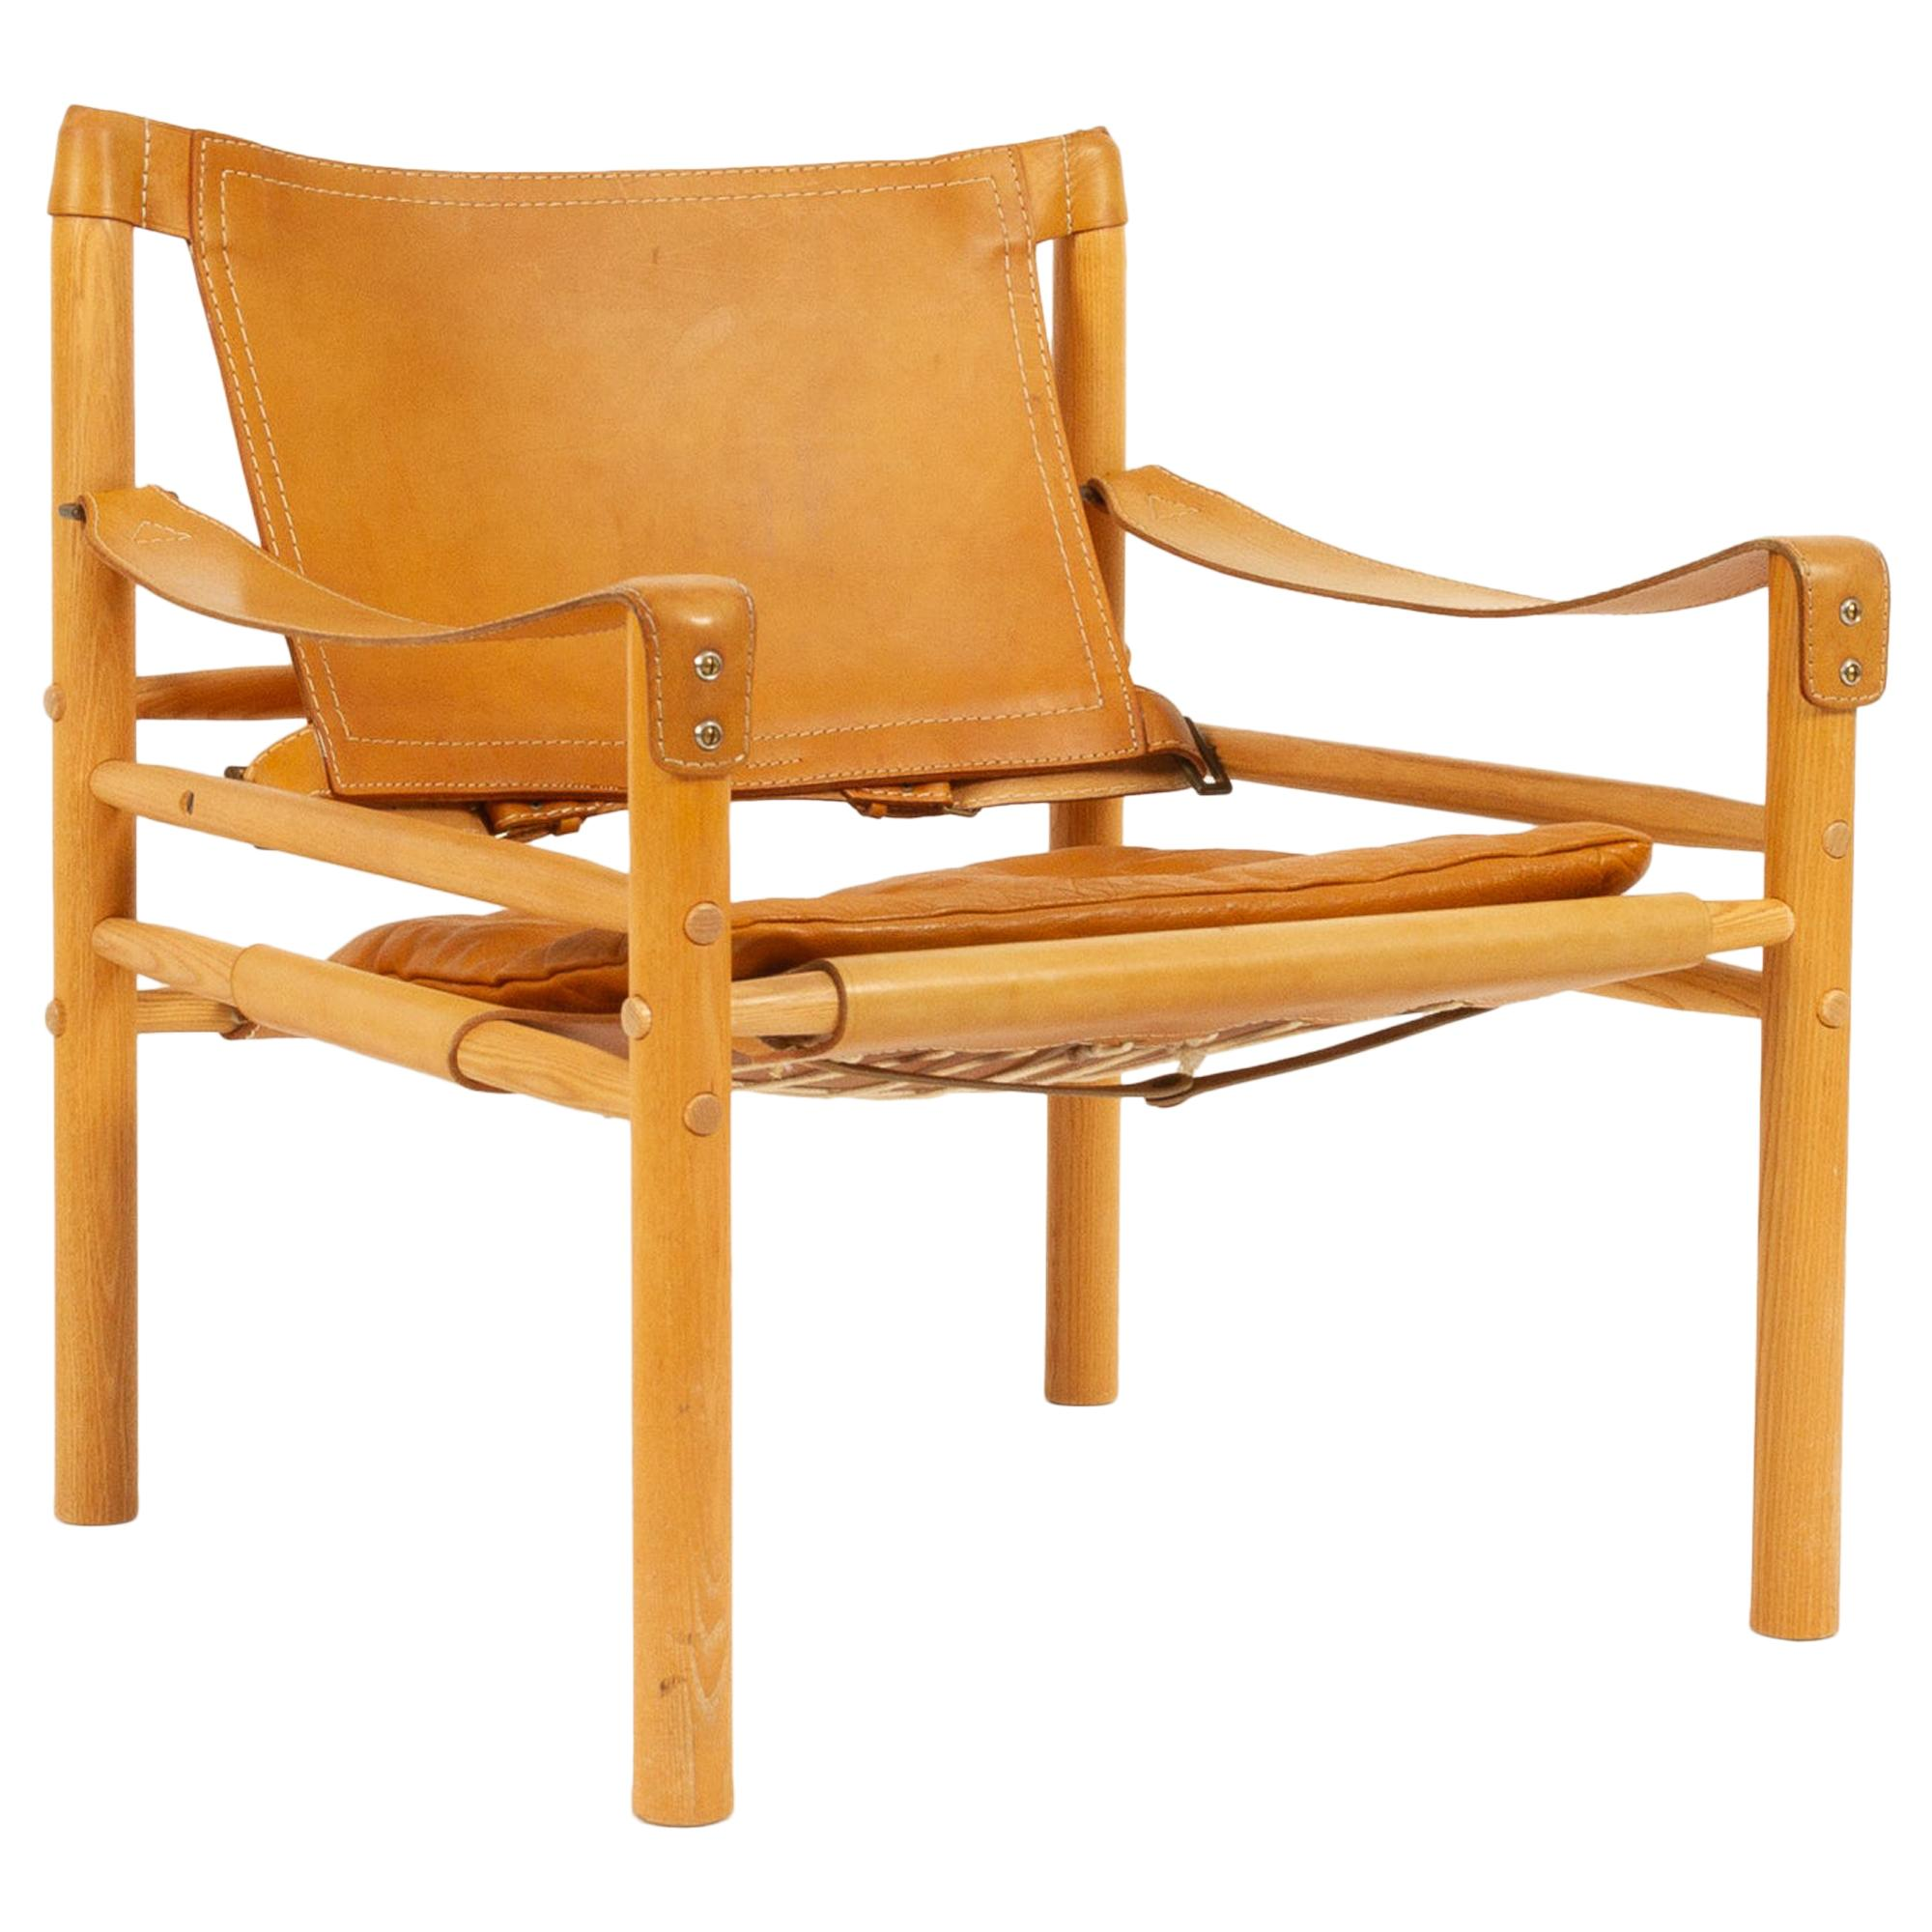 Arne Norell Sirocco Safari Chair, 1960s.